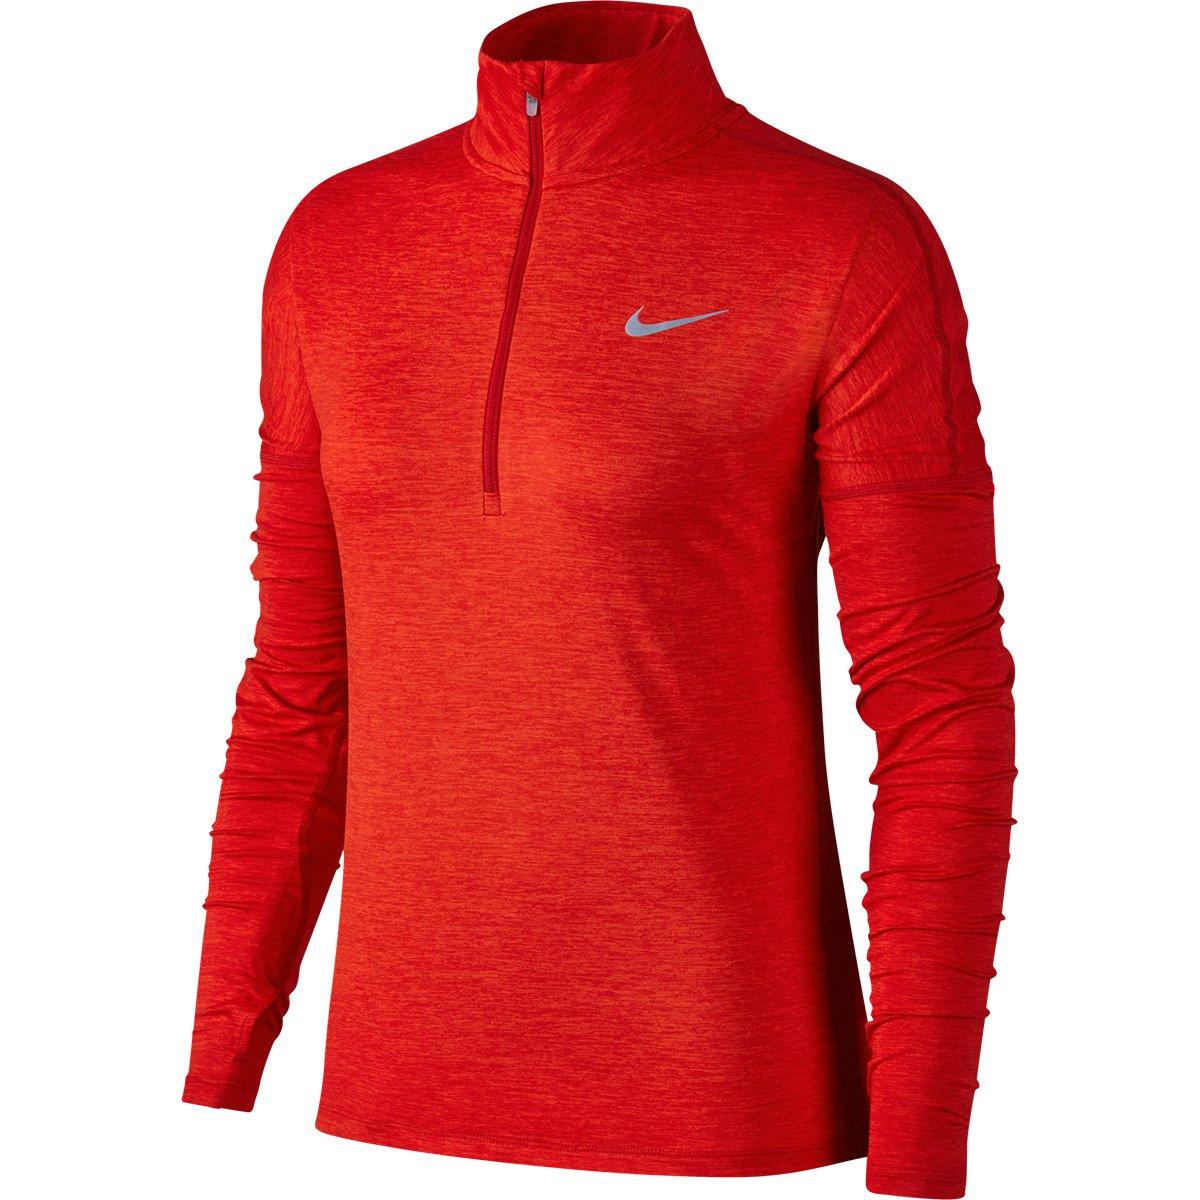 92d563ccb0ca3 Camiseta Nike Dry Element Half-Zip Manga Longa Feminina - Compre Agora